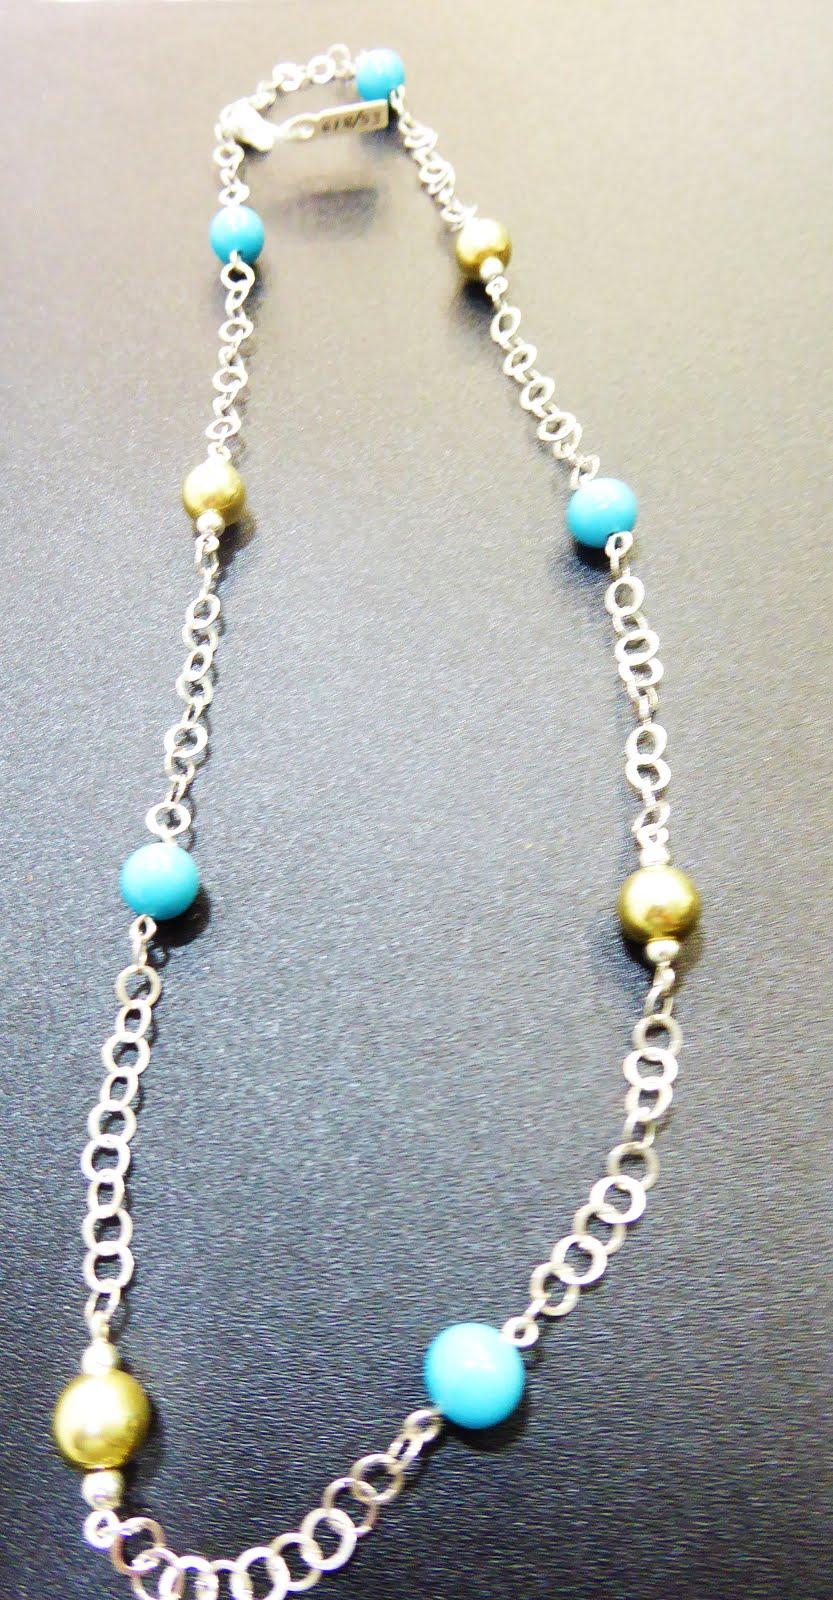 Collar de plata con bolas azules y doradas